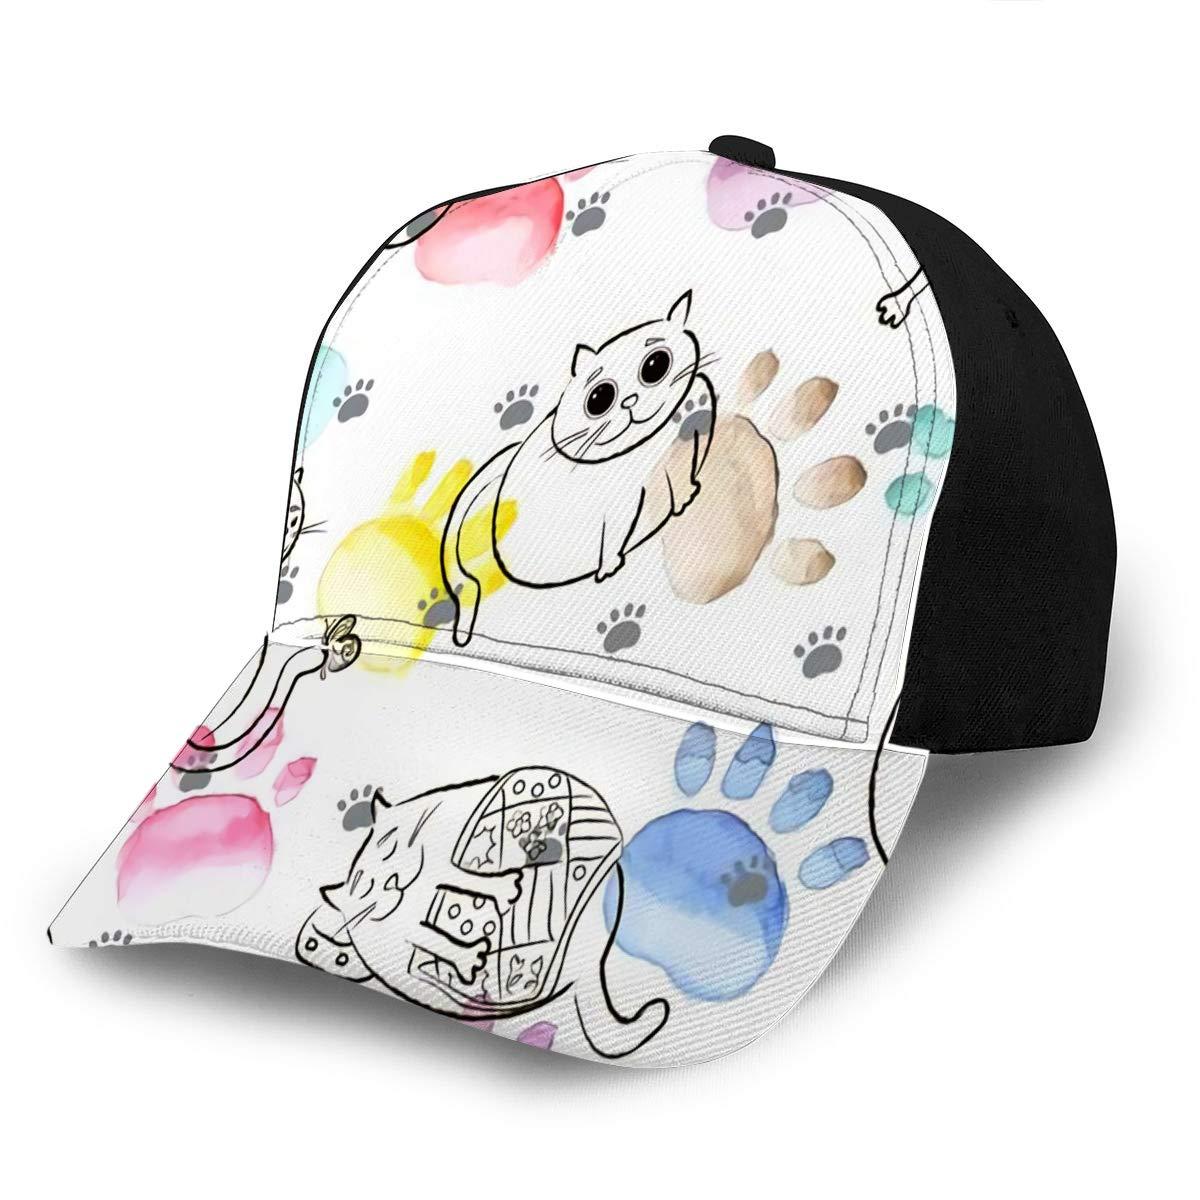 3D Printed Baseball Cap Hats Sketch Fat Cat in Watercolor Fits Men Women Boys Gi